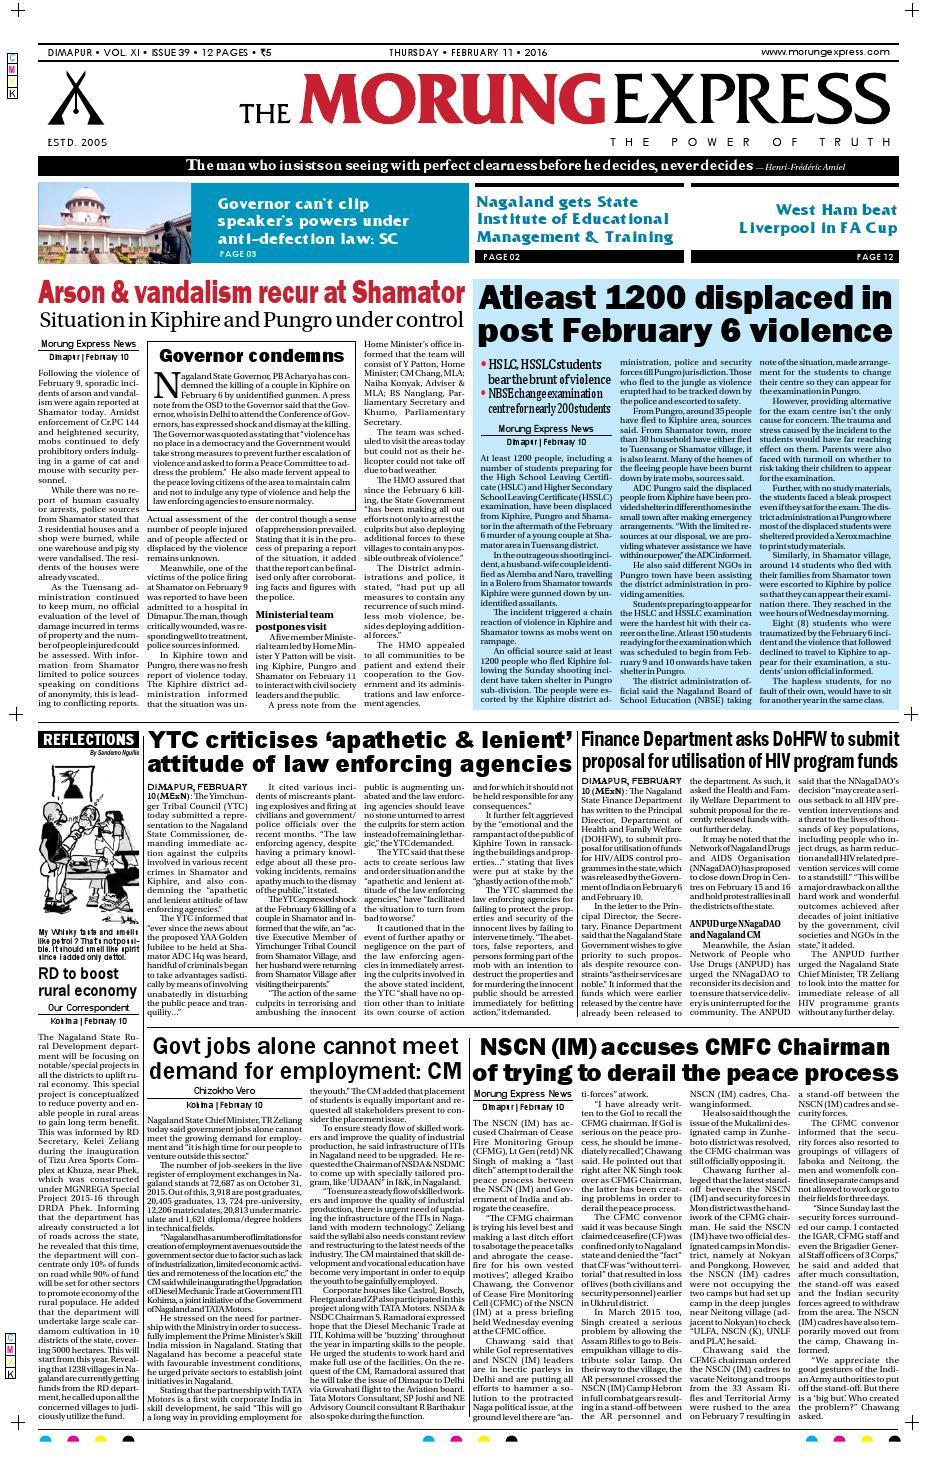 Newspaper clipping service business plan bundle